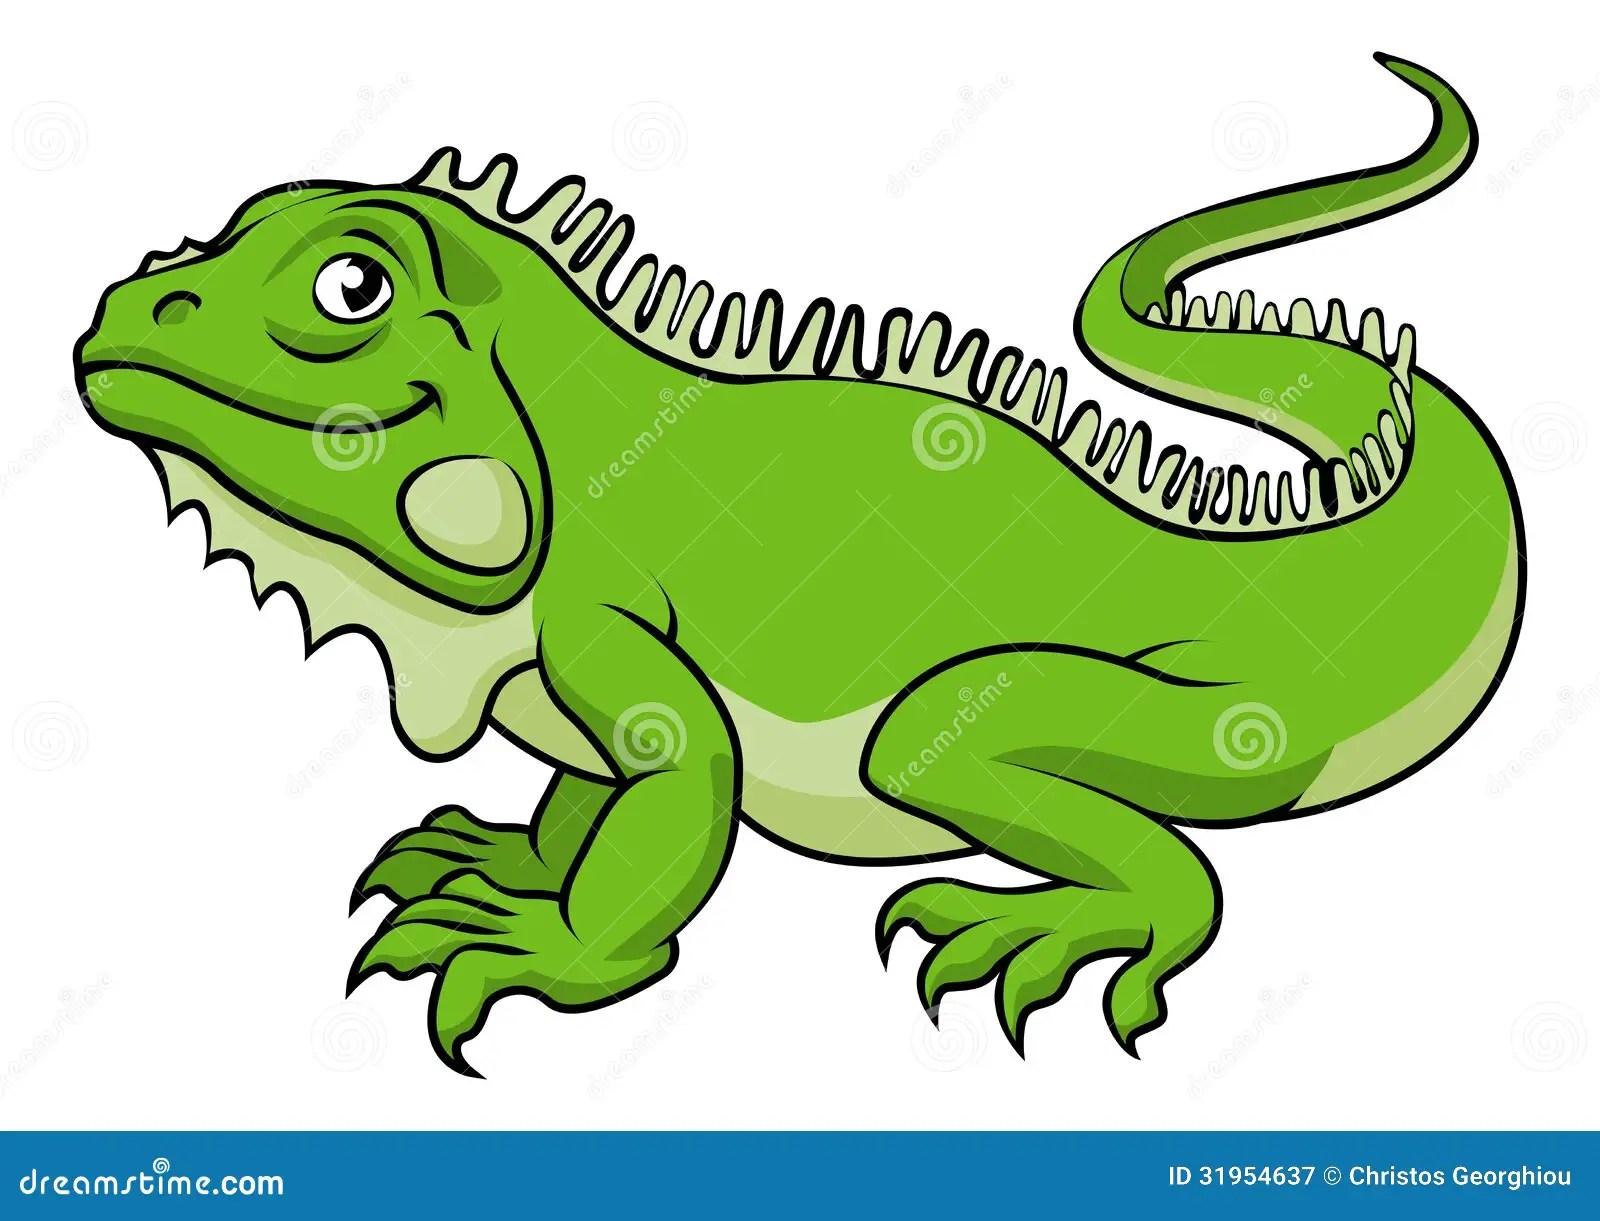 Cartoon Iguana Lizard Stock Vector Illustration Of Cute